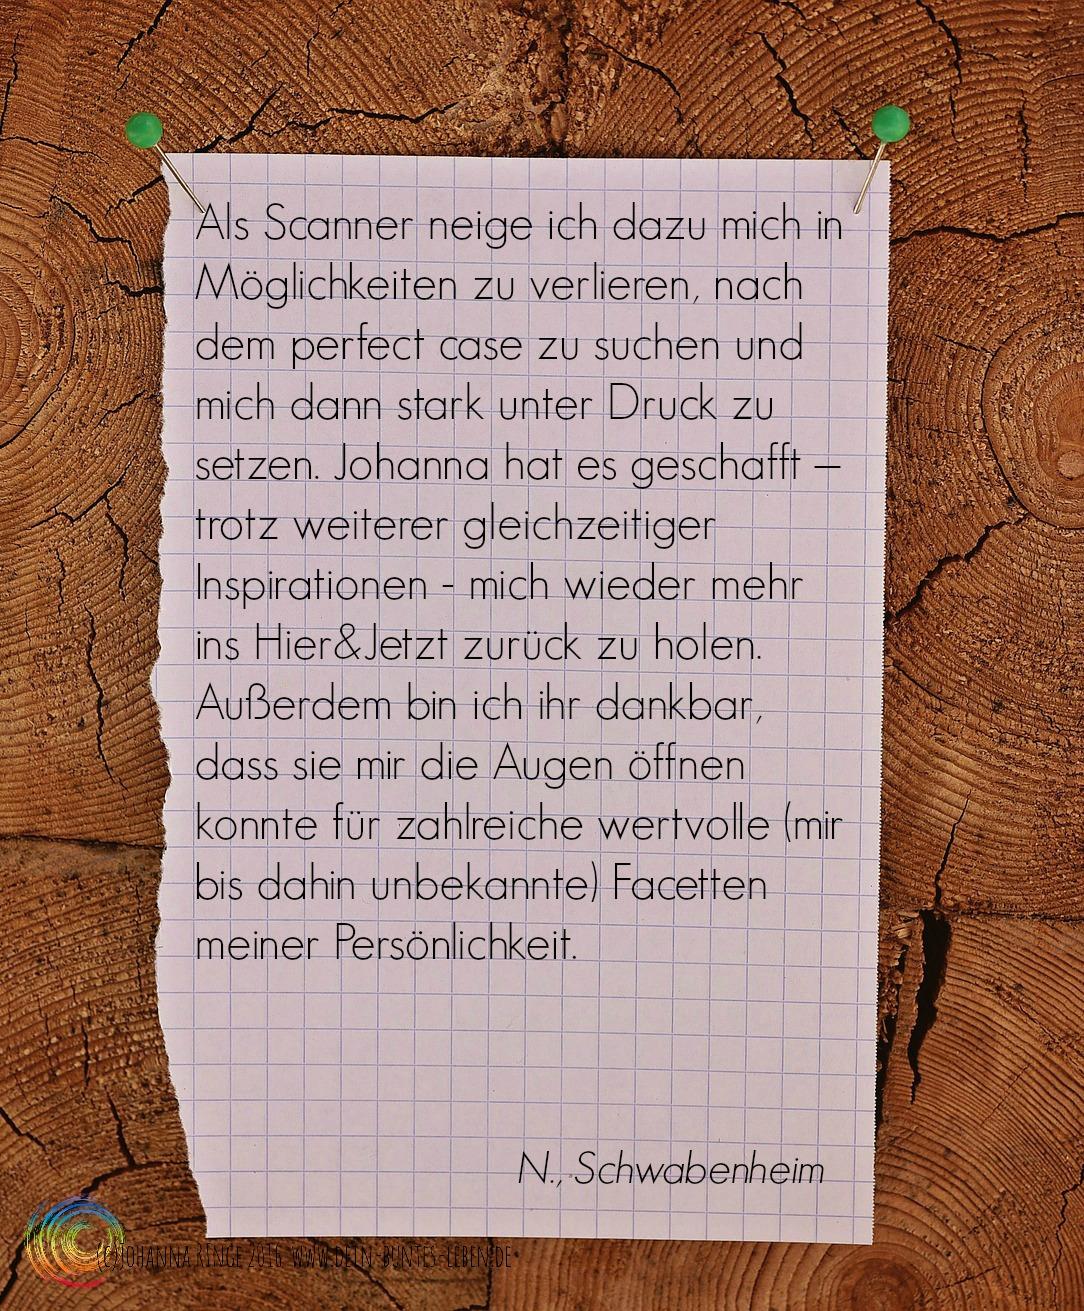 N.R. über Johanna Ringe www.dein-buntes-leben.de